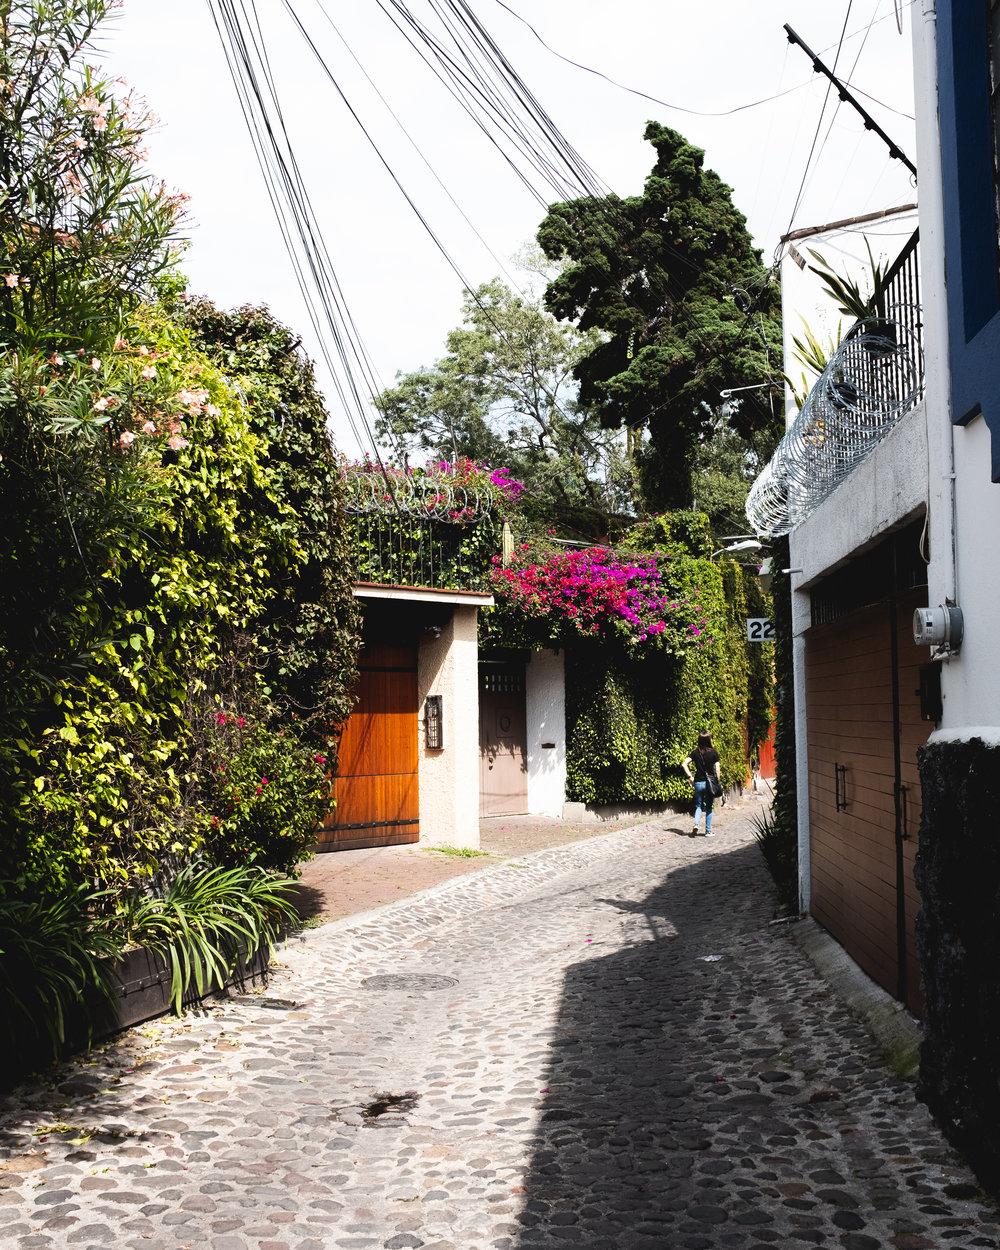 10.11.18 Mexico City-40.jpg